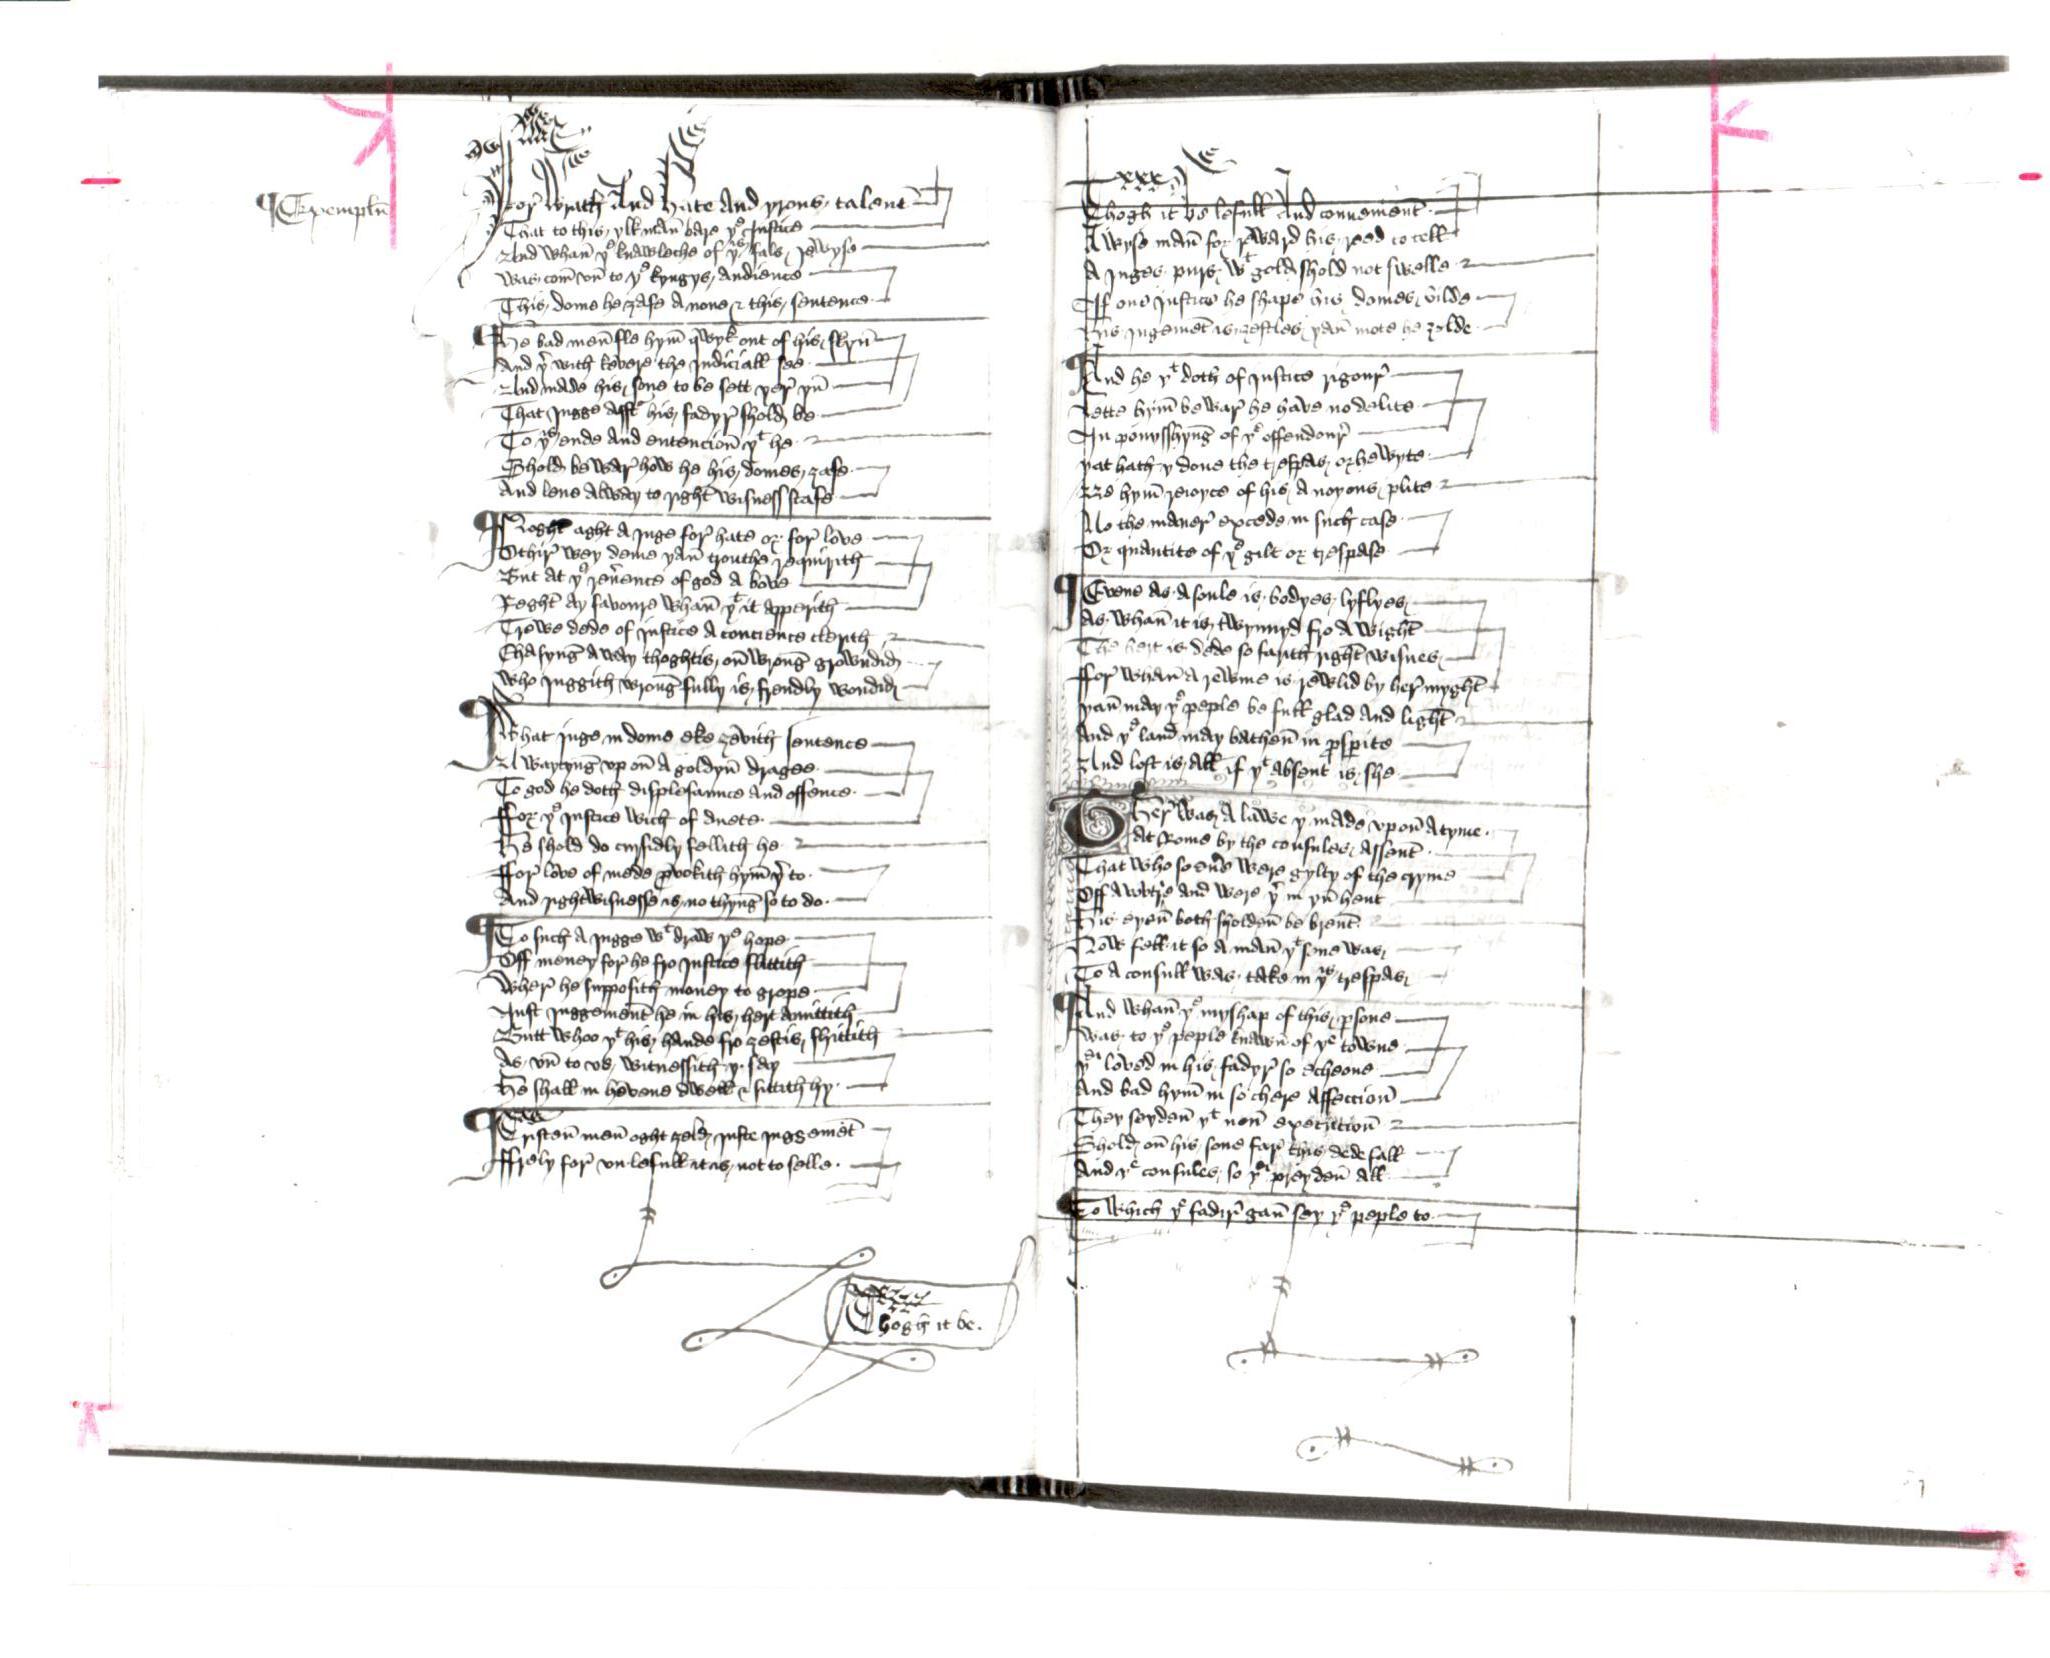 49. Beinecke MS 493, ff. 97v-98r